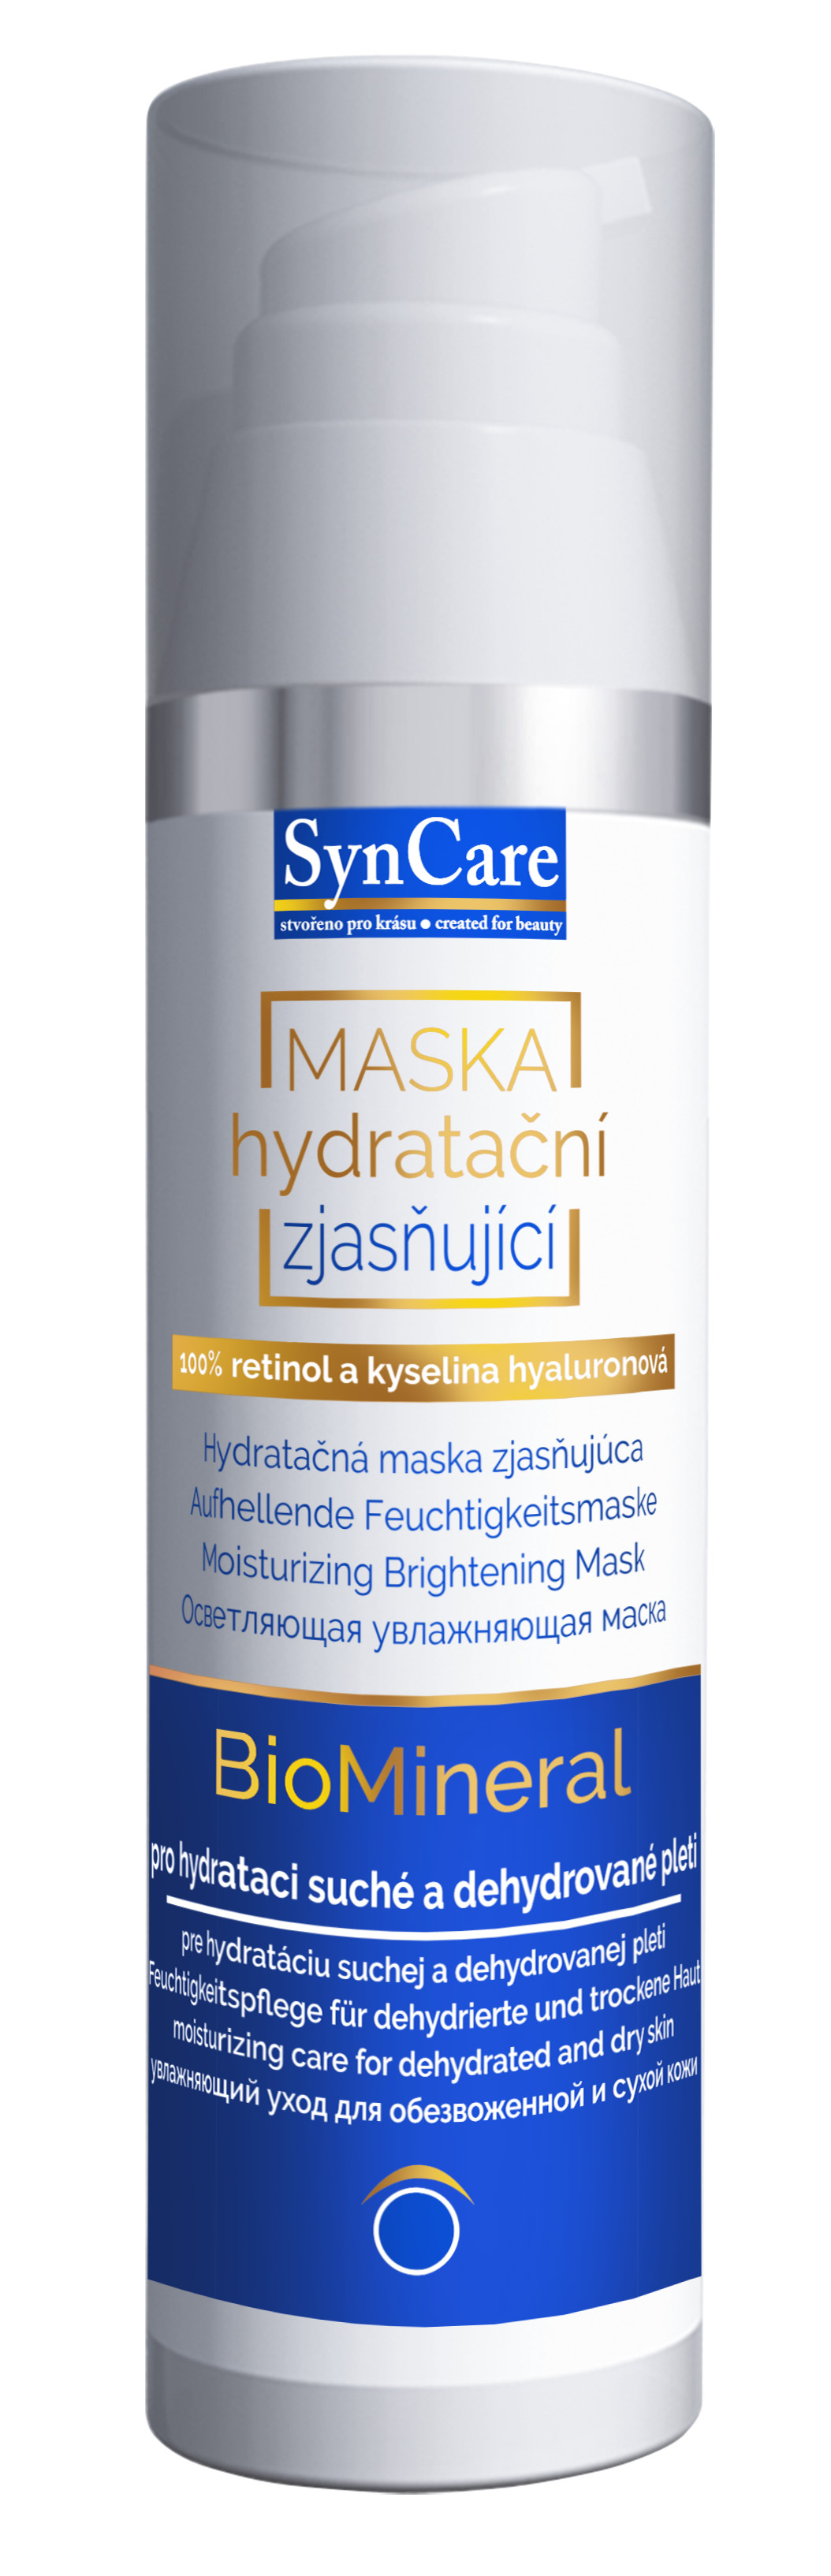 Syncare Hydratační zjasňující maska BioMineral 75 ml + DOPRAVA ZDARMA po celý rok!